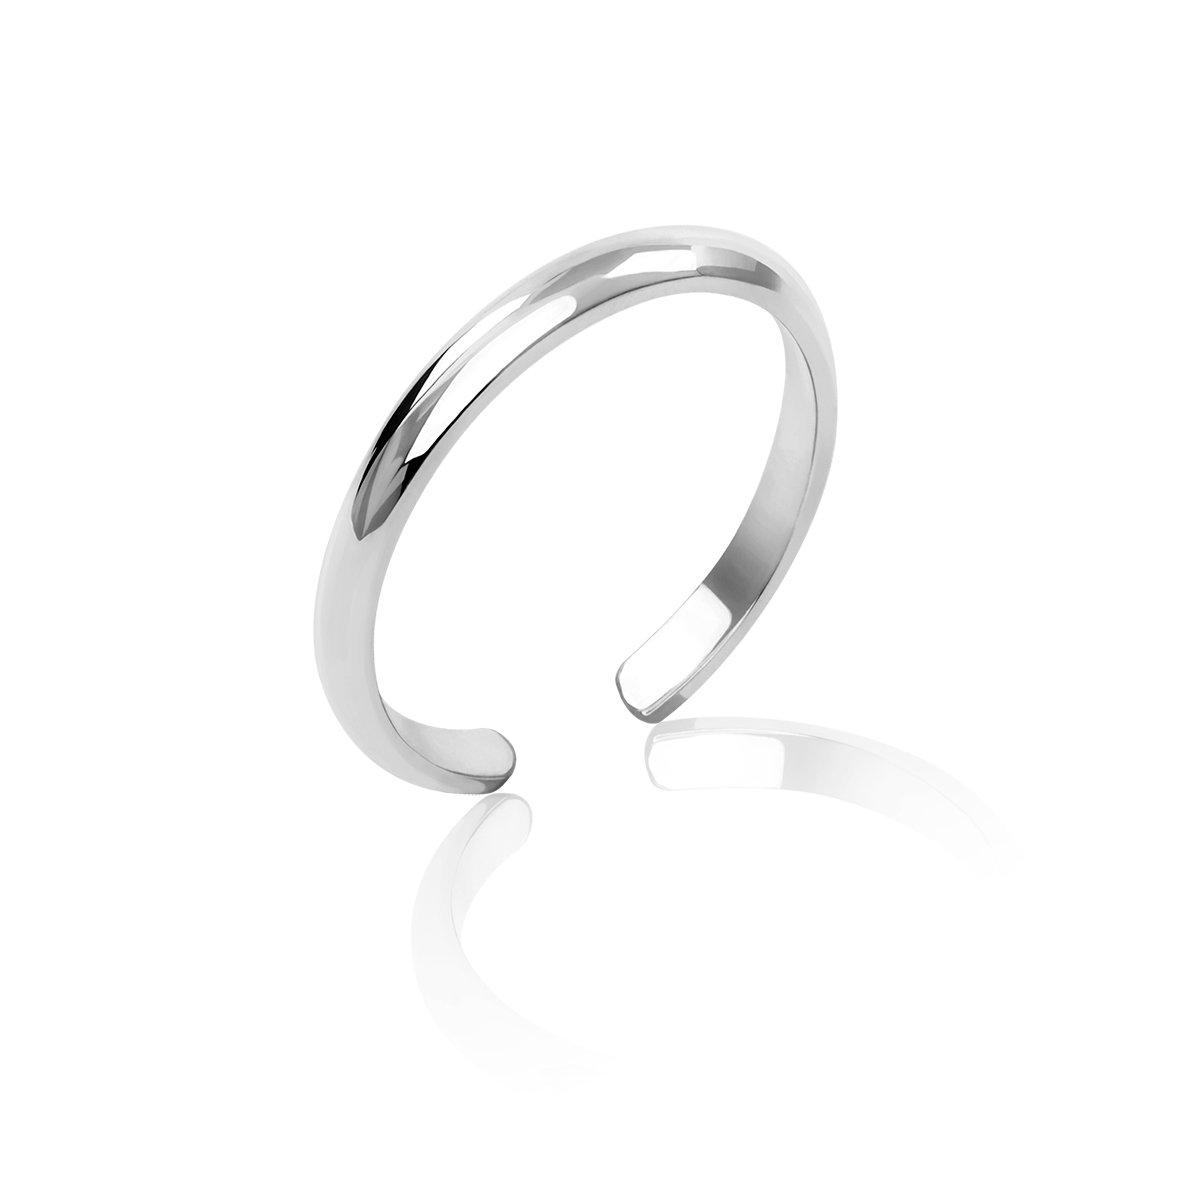 Honolulu Jewelry Company Sterling Silver Band Toe Ring (2mm)